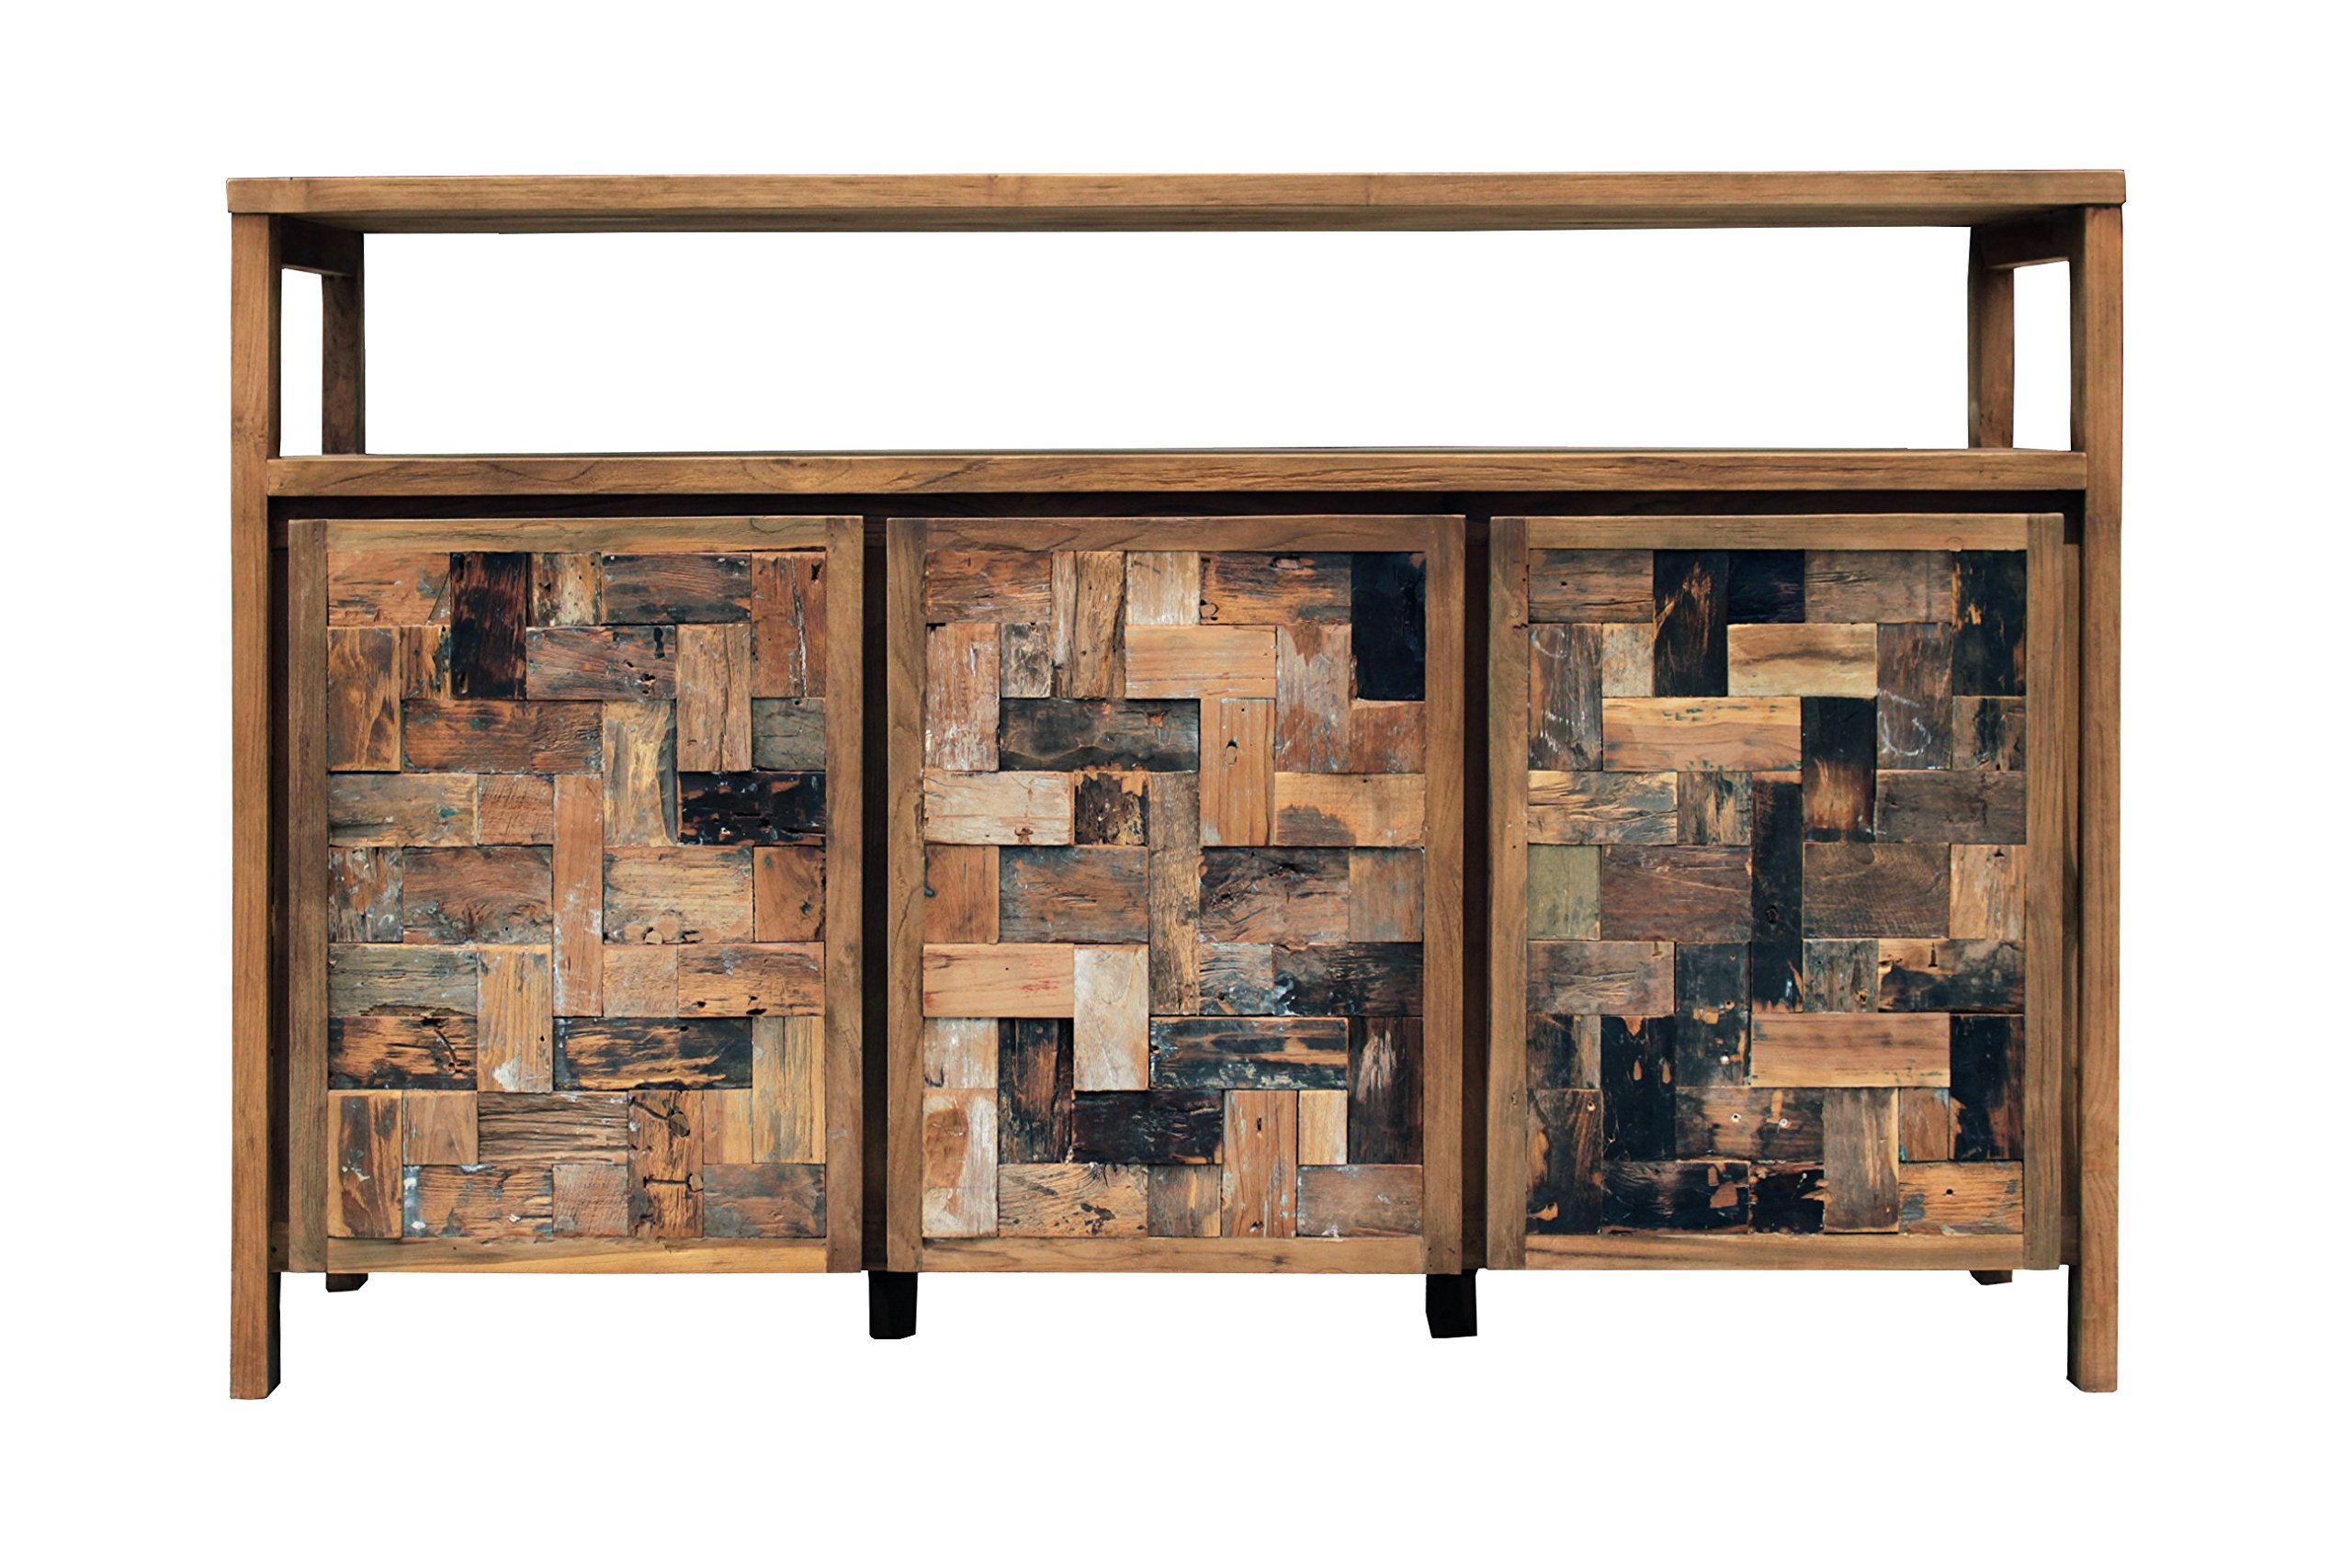 Recycled Teak Mozaik Buffet 3 Wooden Doors Made By Chic Teak